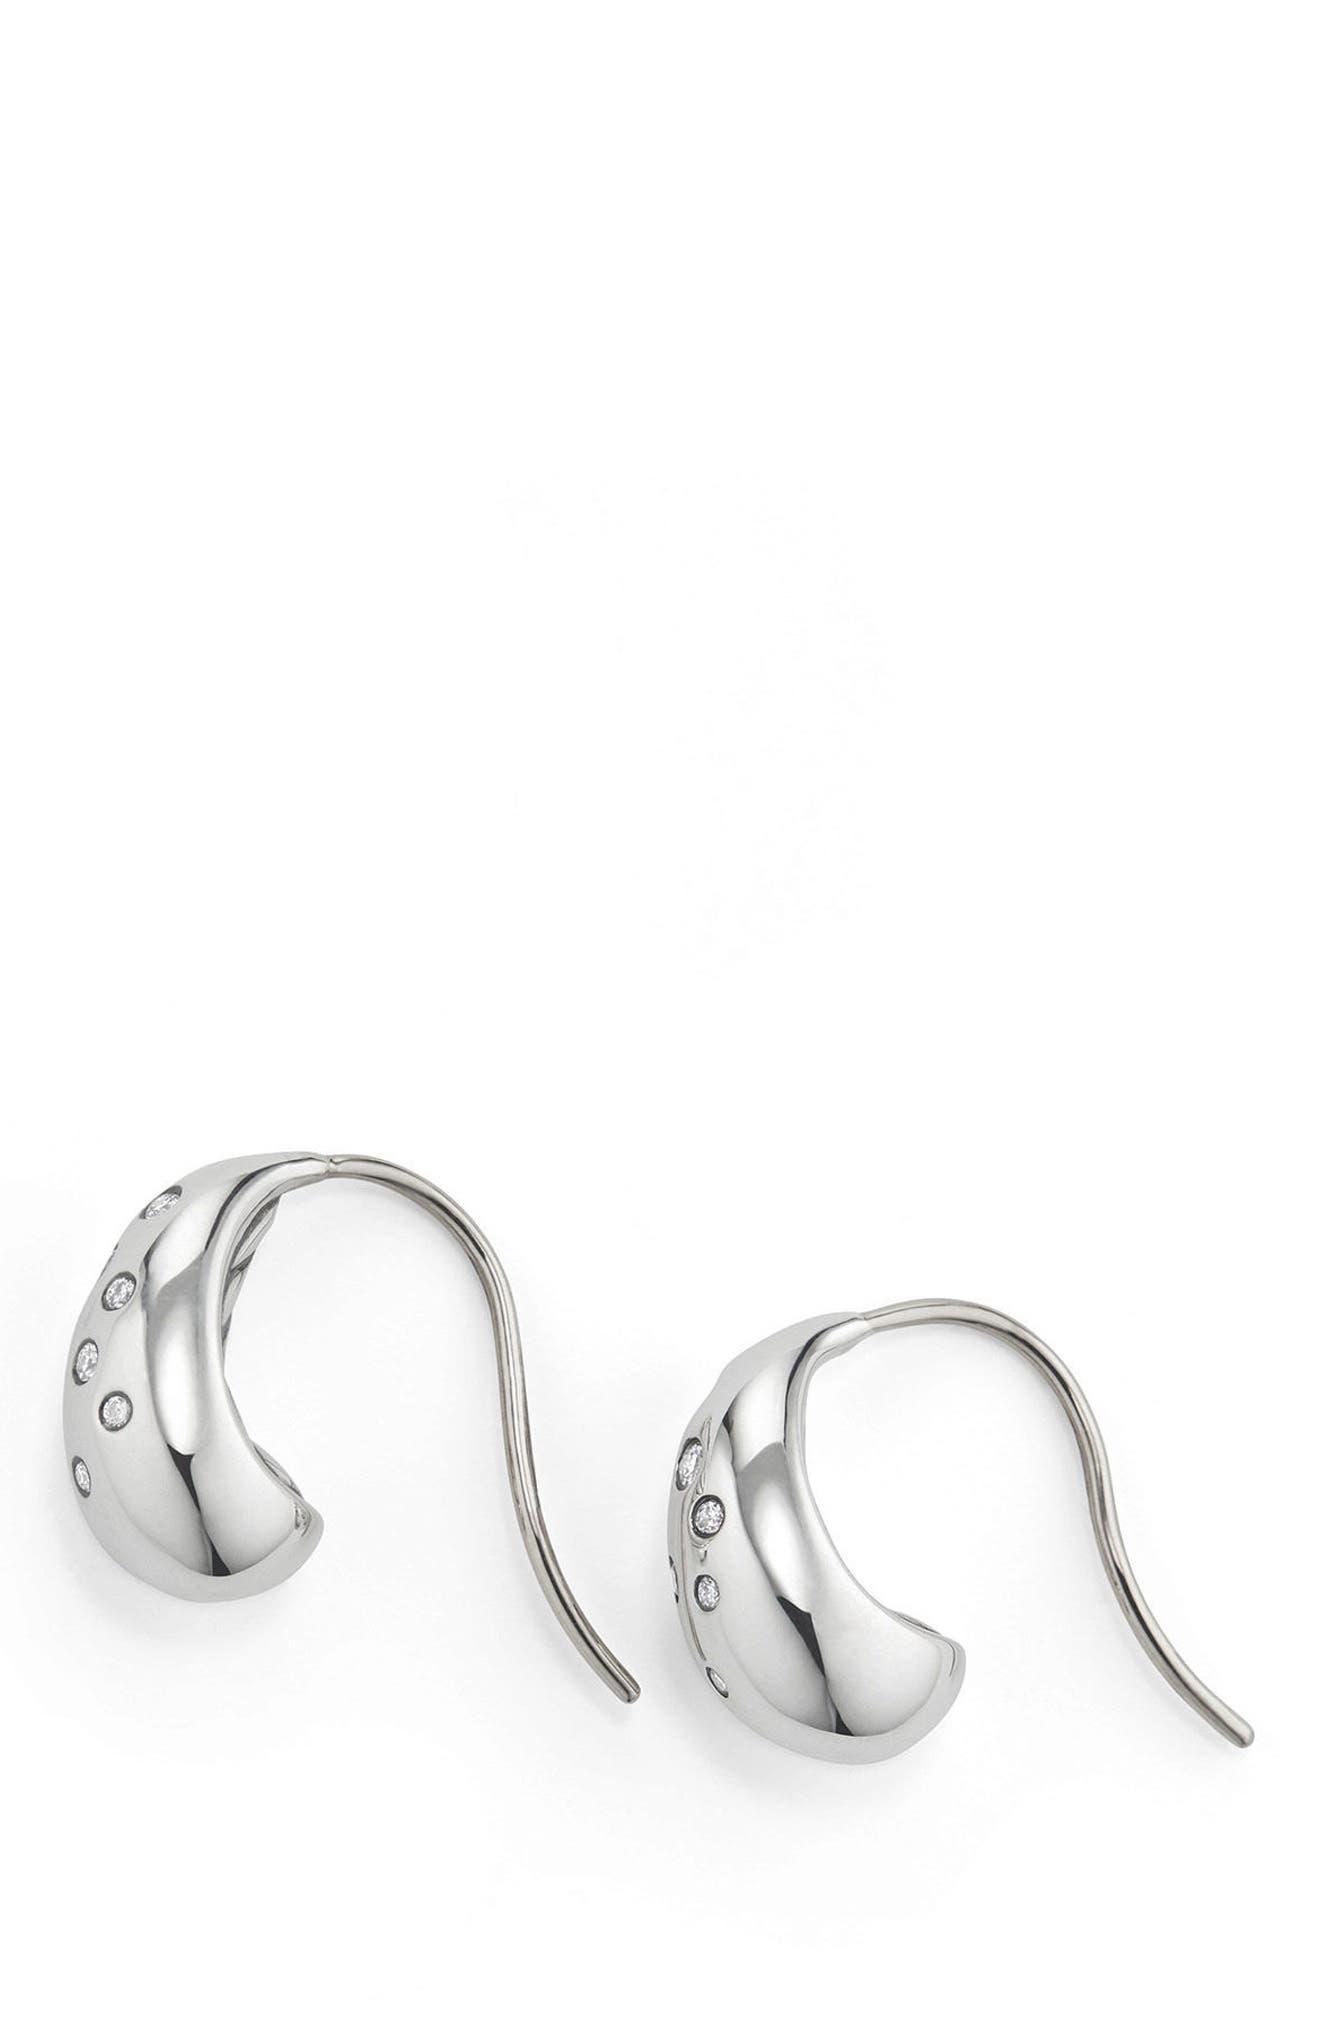 Main Image - David Yurman Pure Form Earrings with Diamonds, 15mm